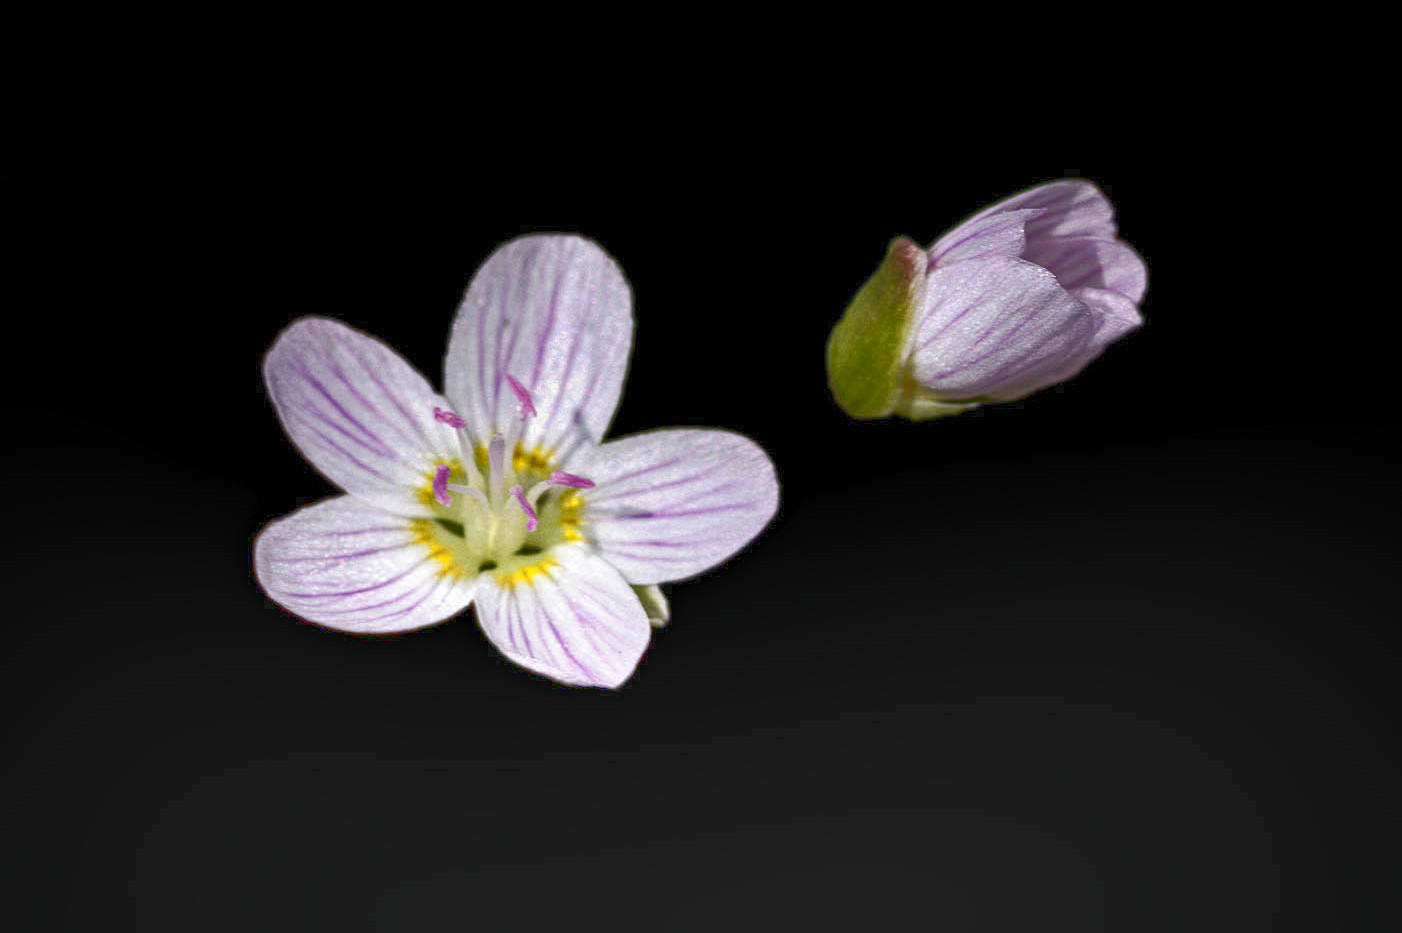 A Virginia Springbeauty And Blossom